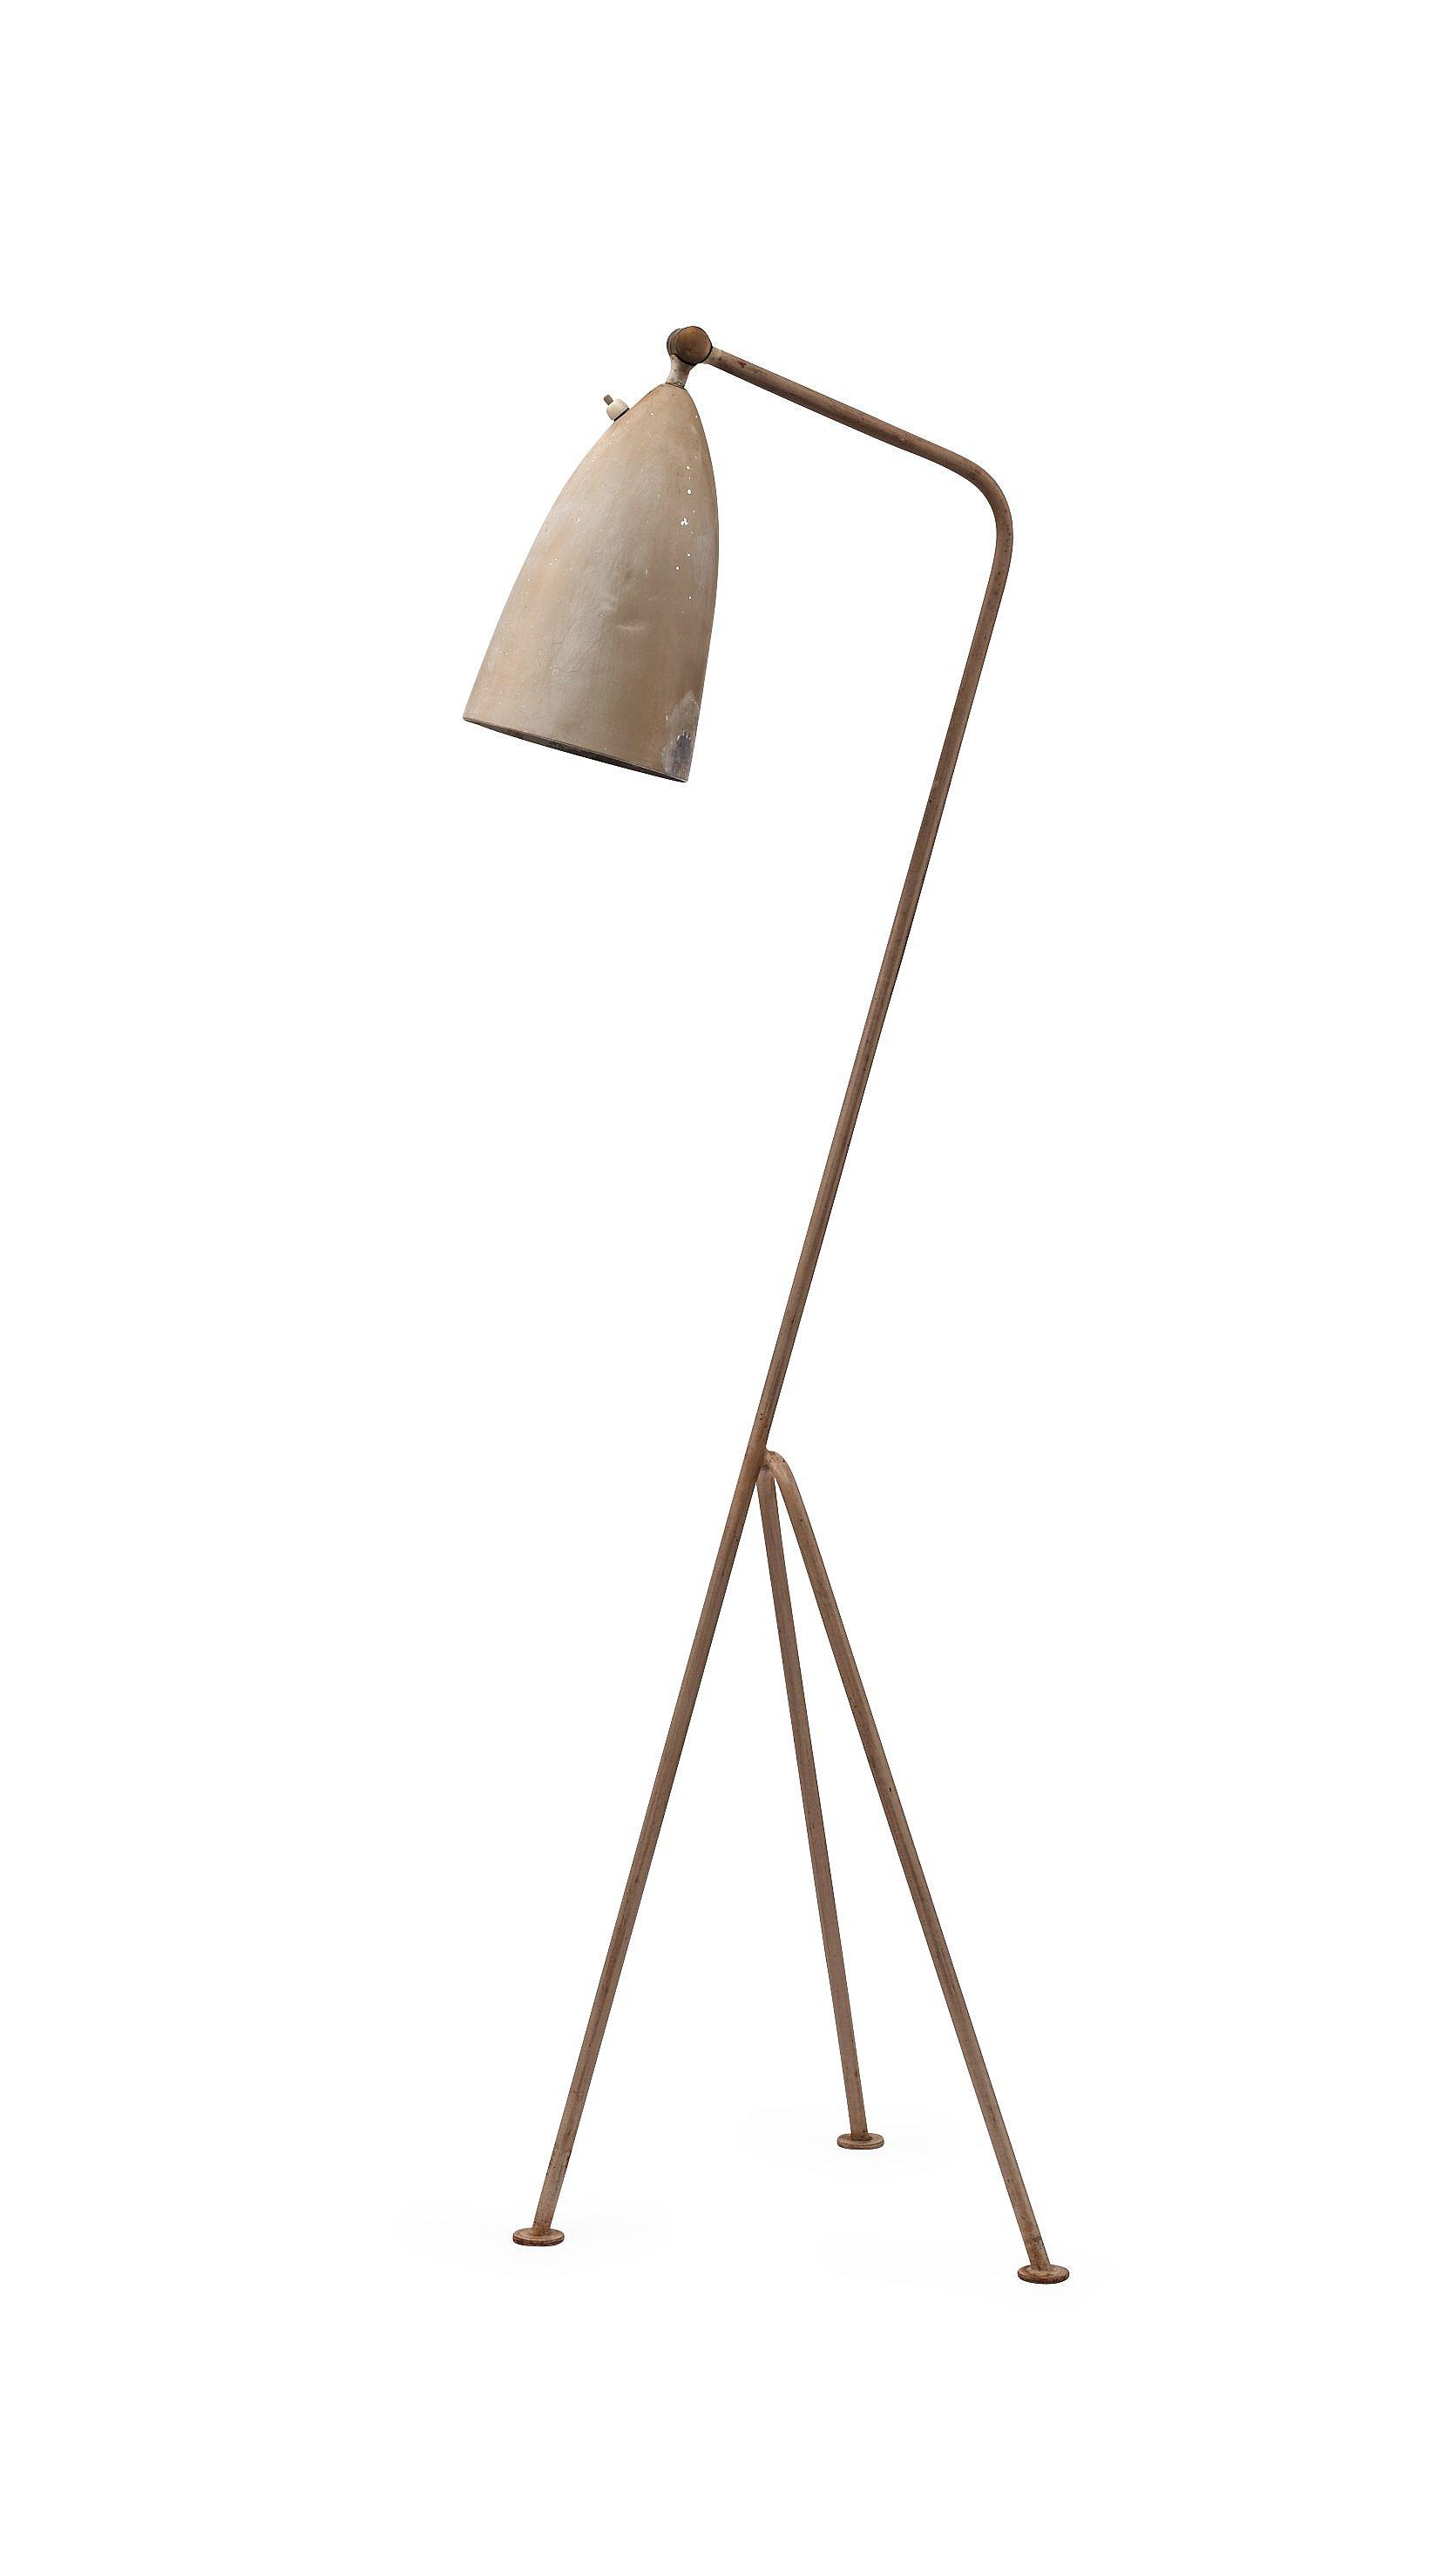 GRETA MAGNUSSON GROSSMAN, golvlampa, Bergboms, Malmö 1950 tal, modell G 33 Bukowskis